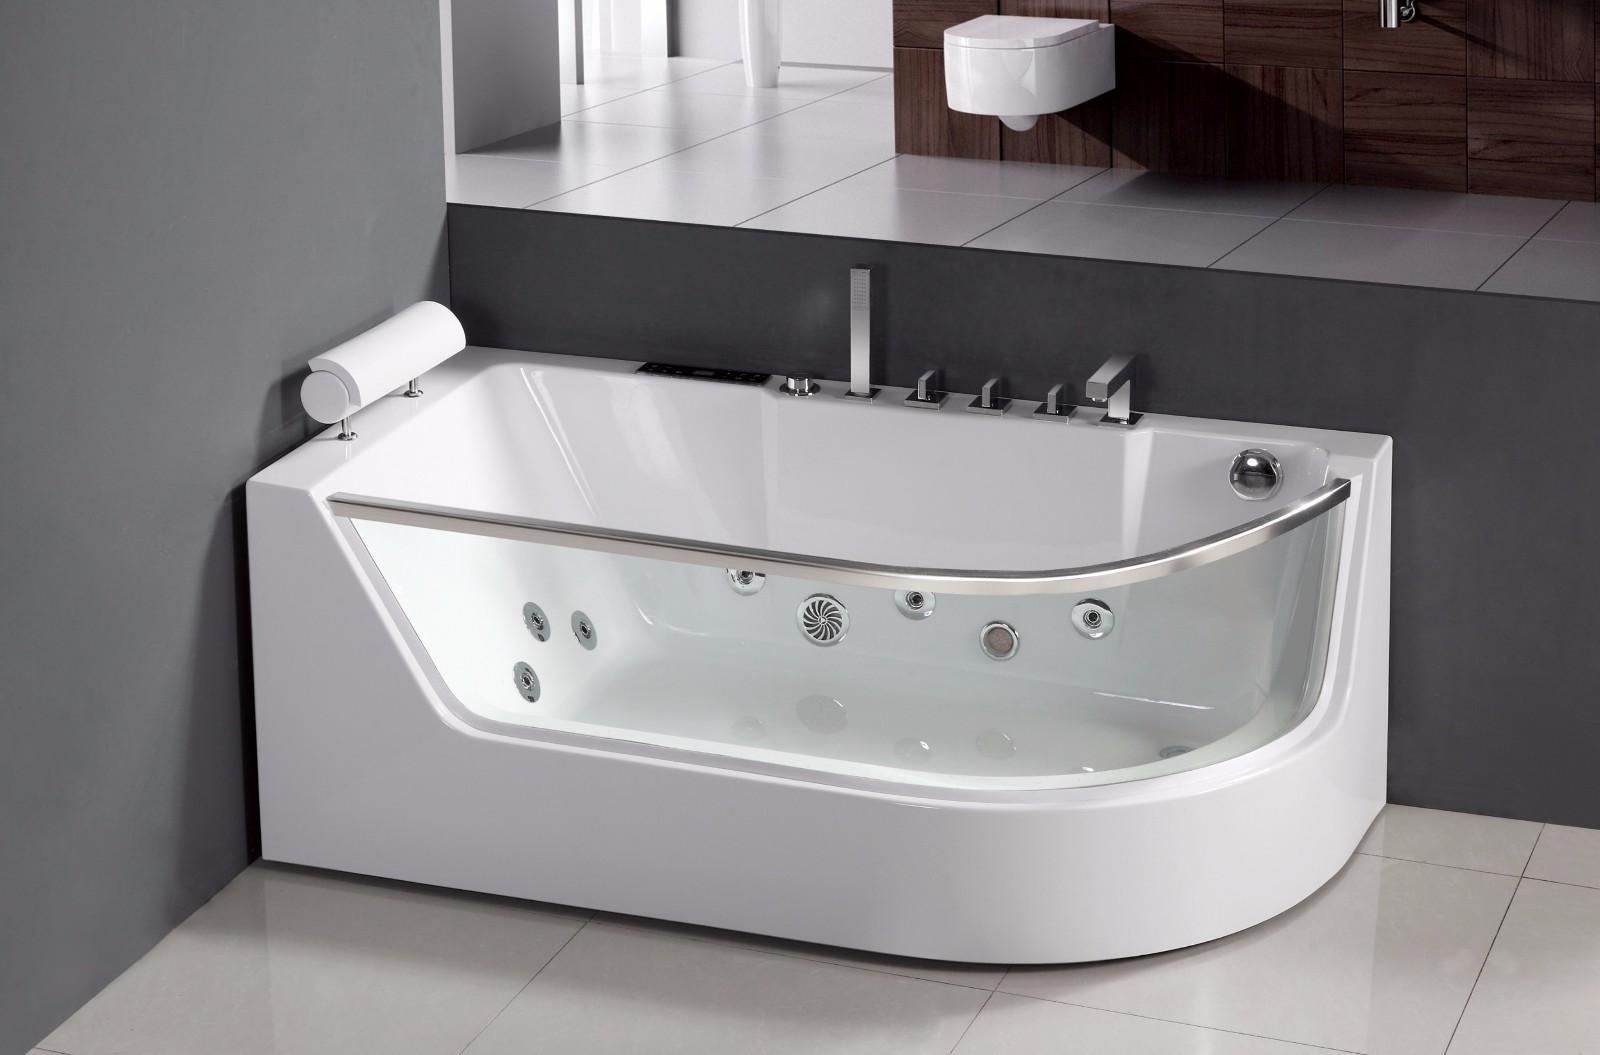 C-402-YT C-403-YT Acrylic Glass Jetted Hot Sale Tub Bathroom Bathtub with Pillow.jpg